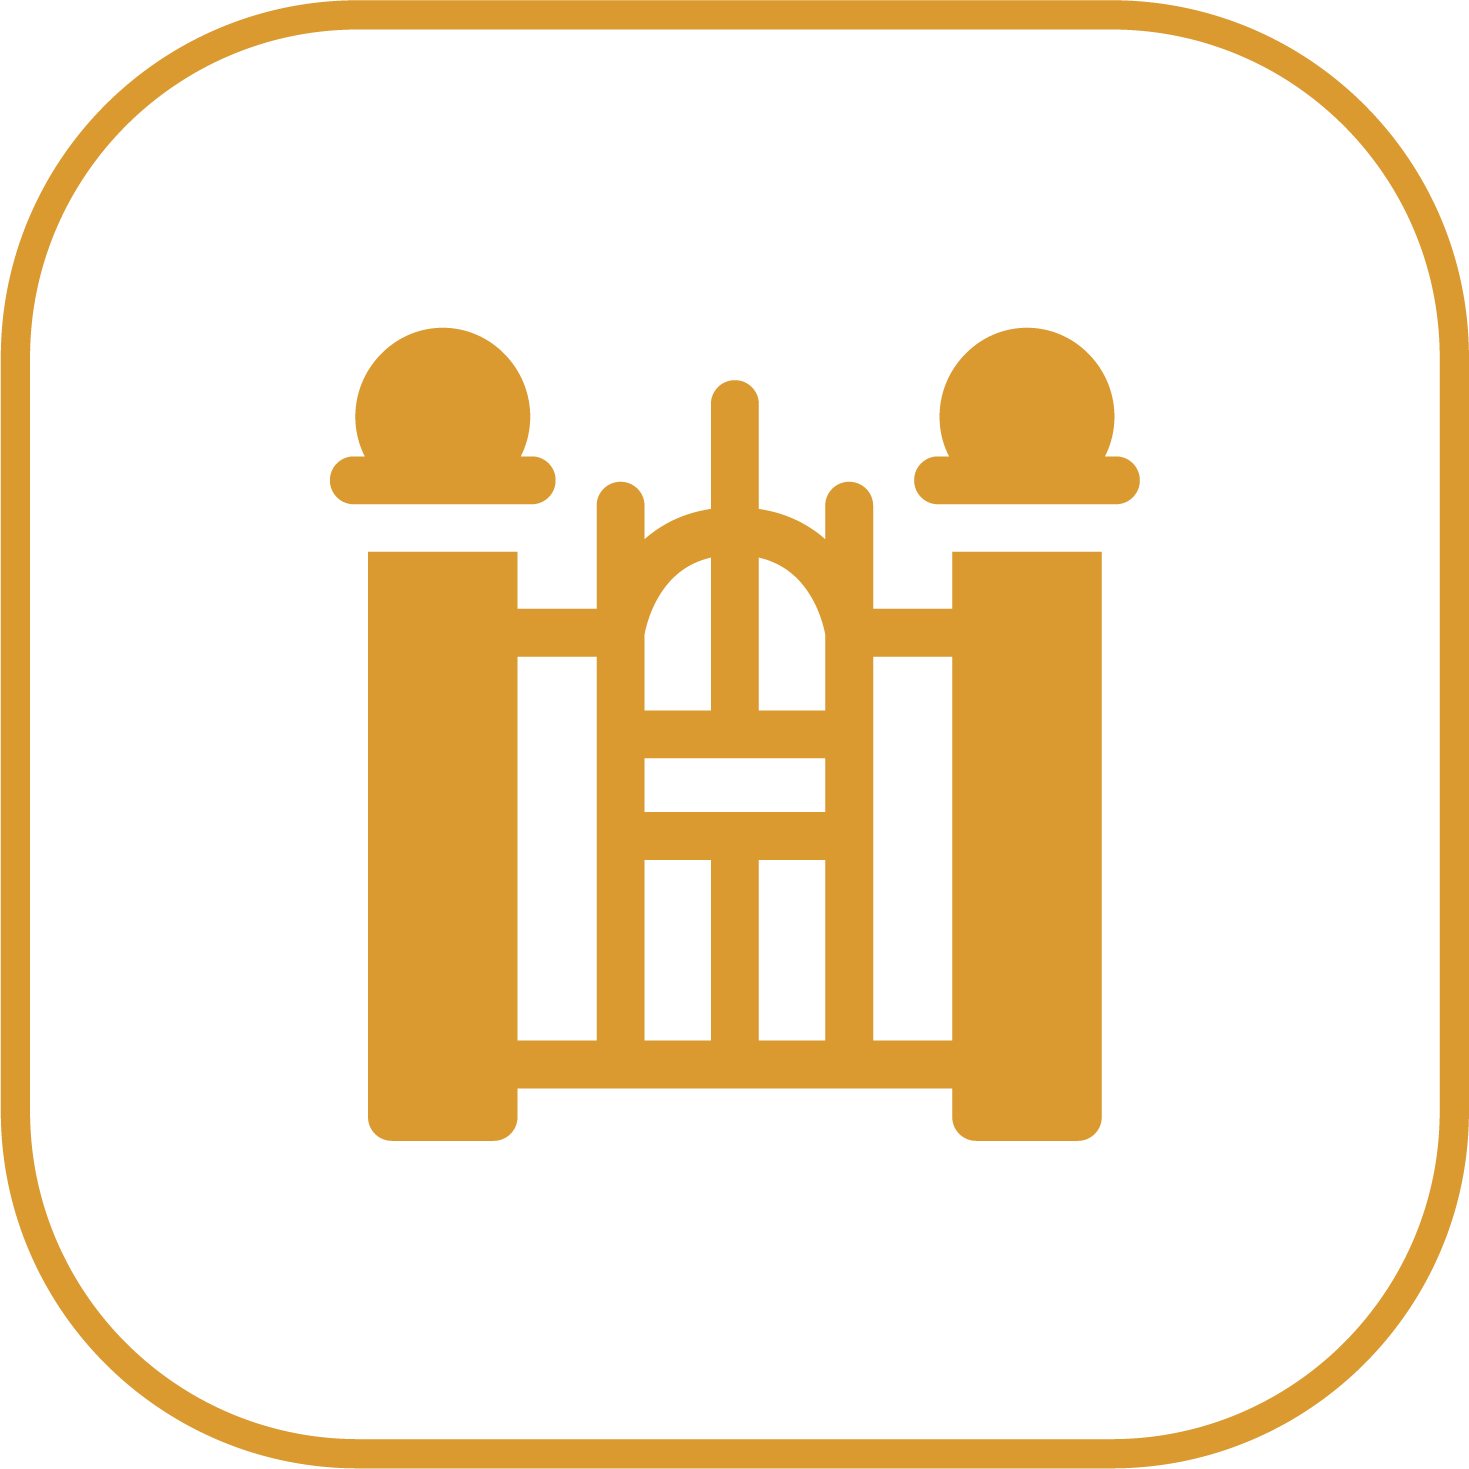 Pesona Remboelan Serpong - Rumah 2 Lantai Cukup DP 34 Juta Langsung Akad 8